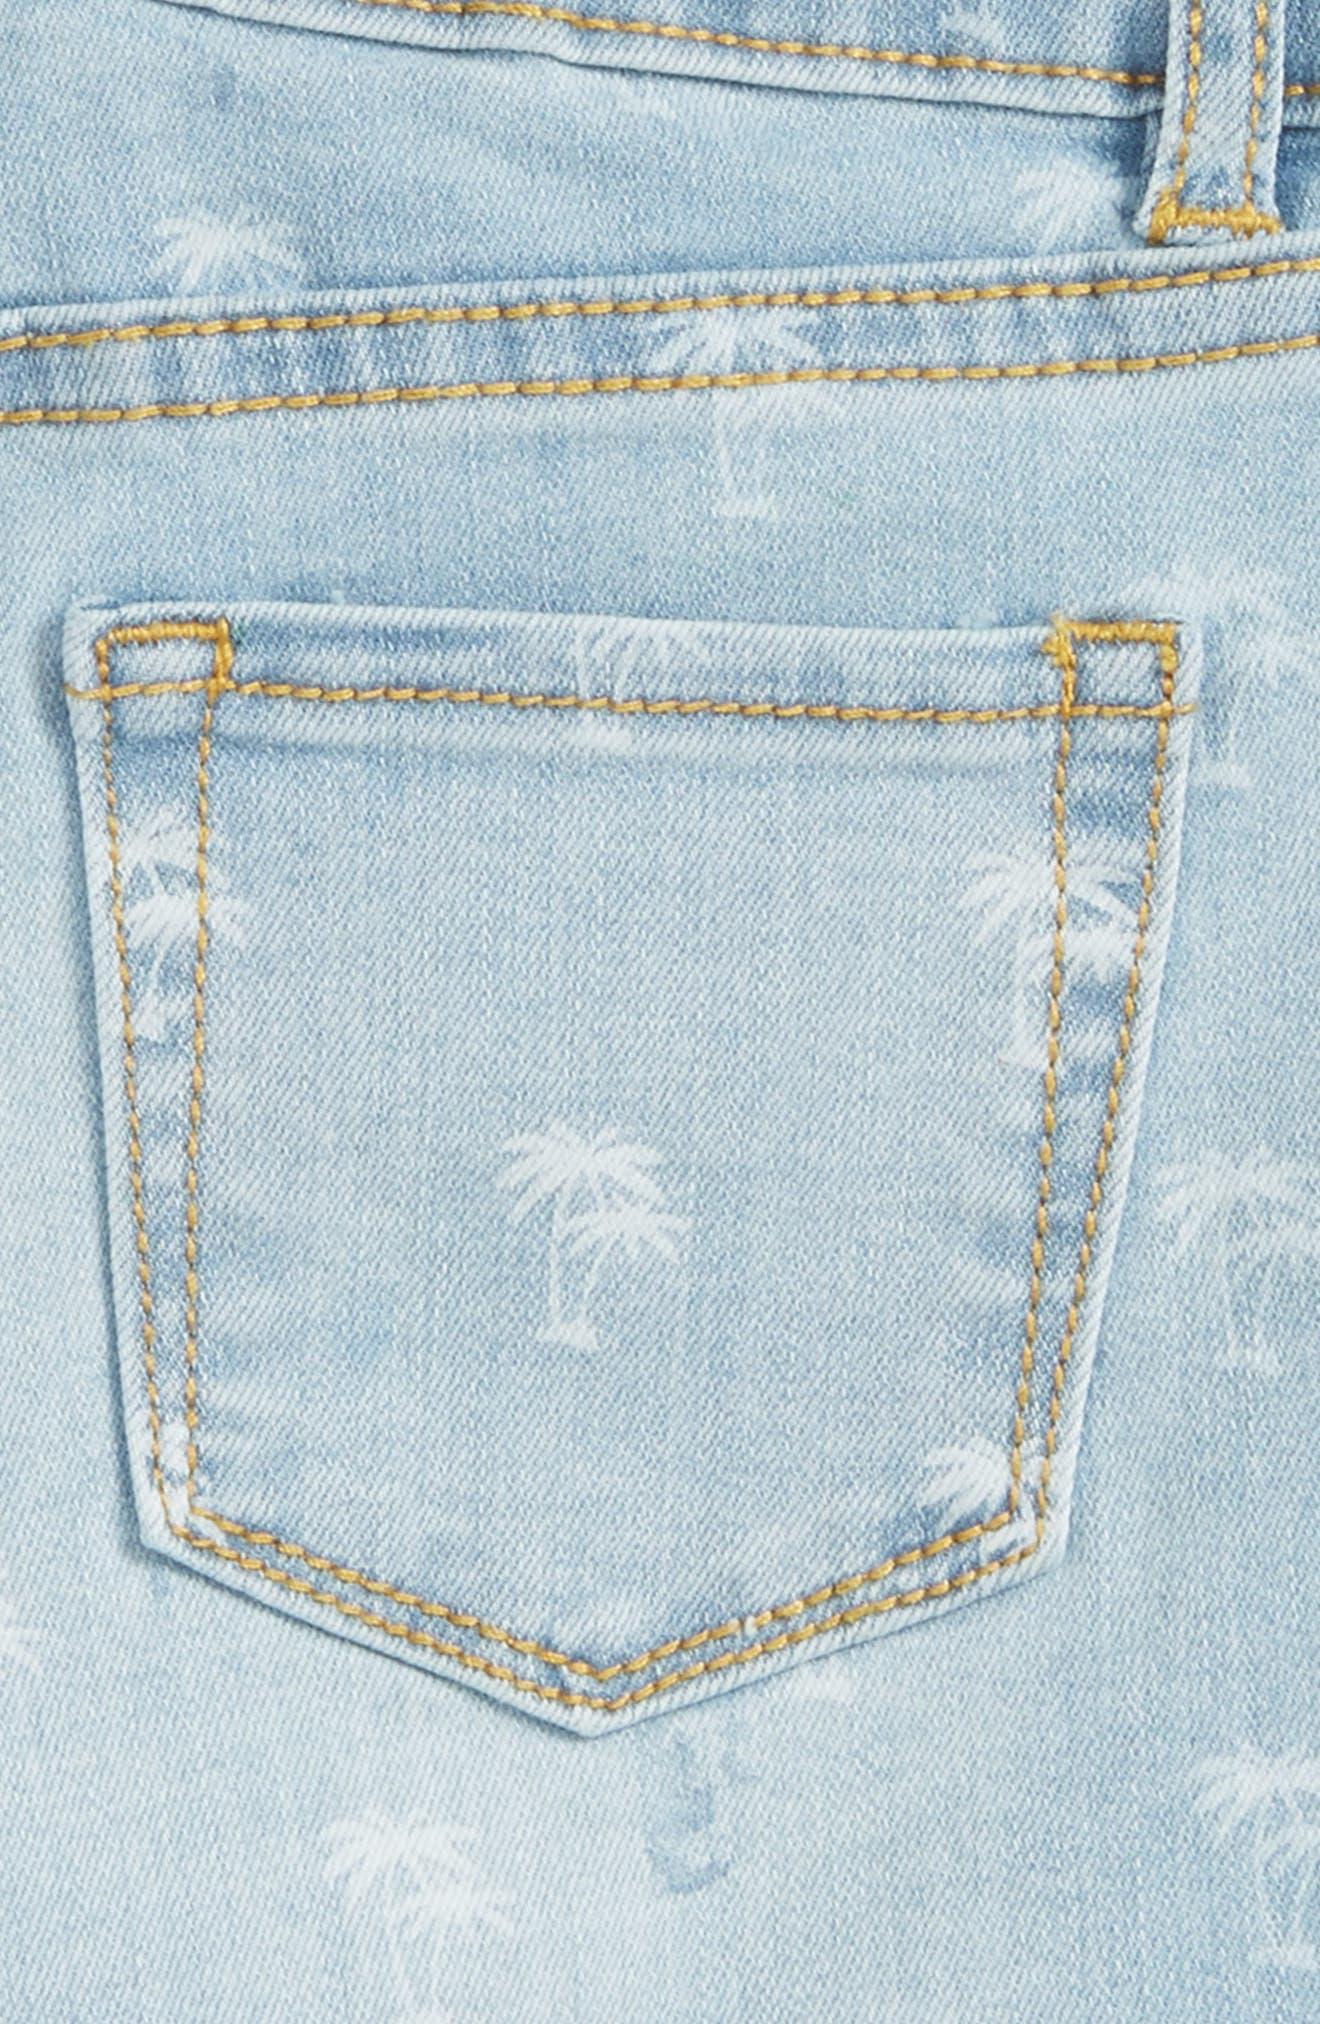 Griffin Palm Tree Denim Shorts,                             Alternate thumbnail 3, color,                             451